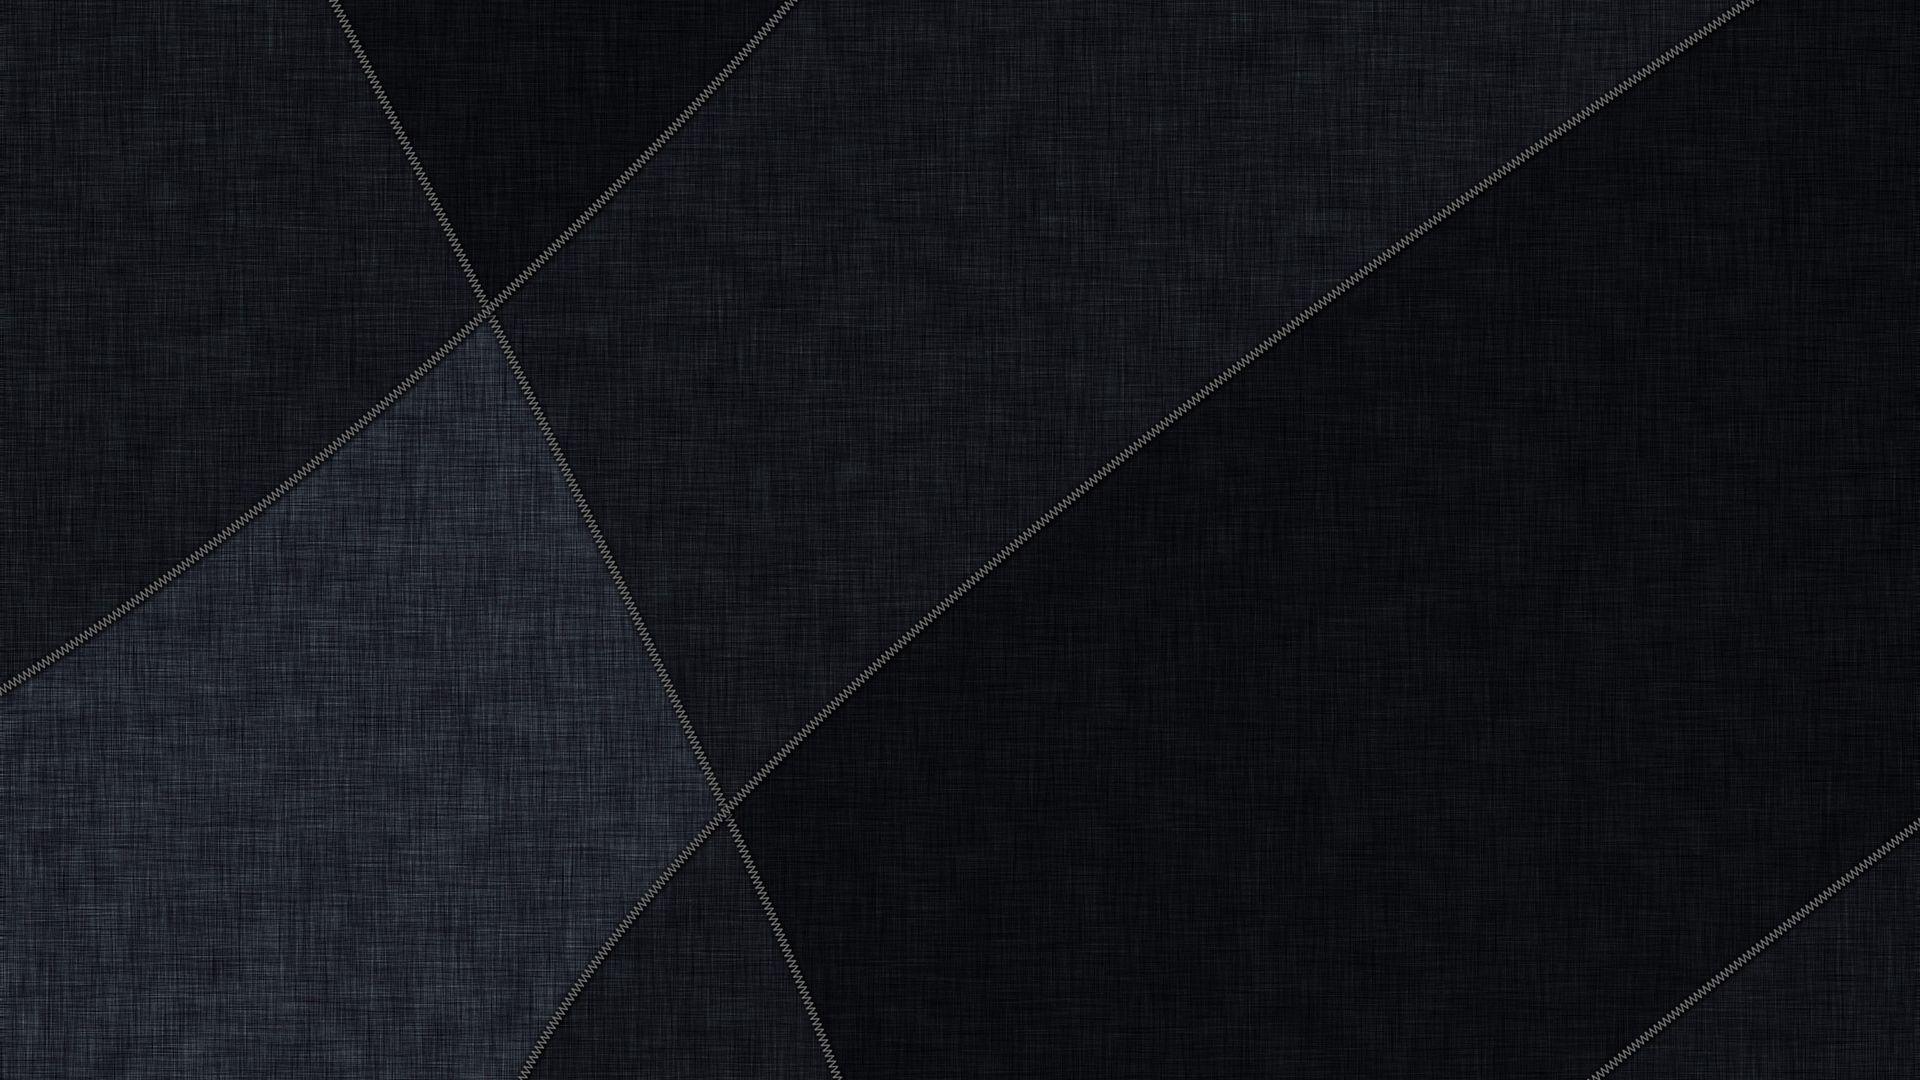 Dark Background With Lines